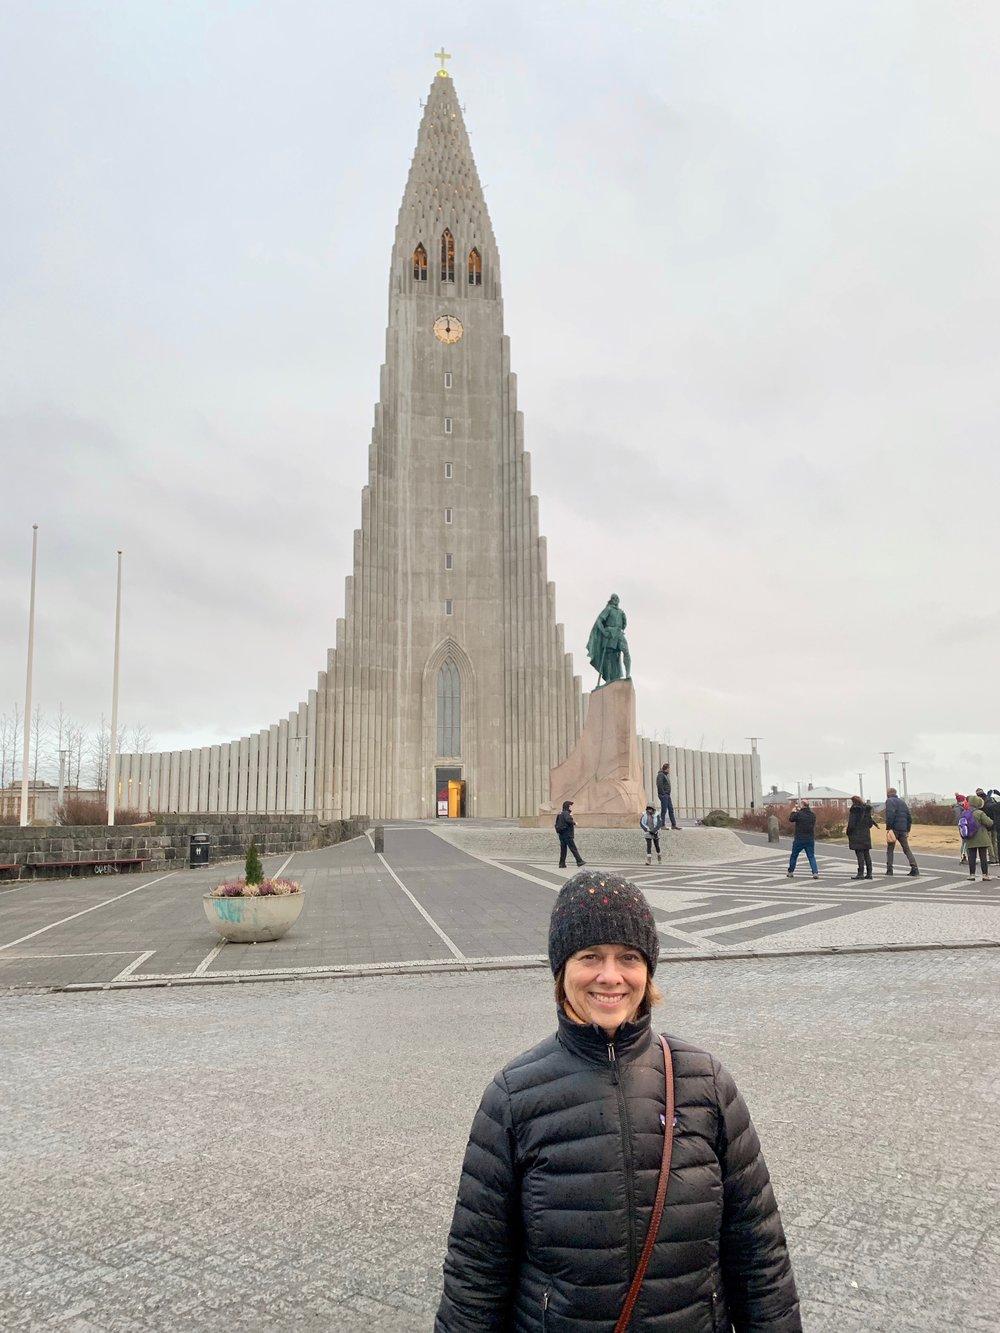 Hallgrímskirkja, the Reykjavik Cathedral